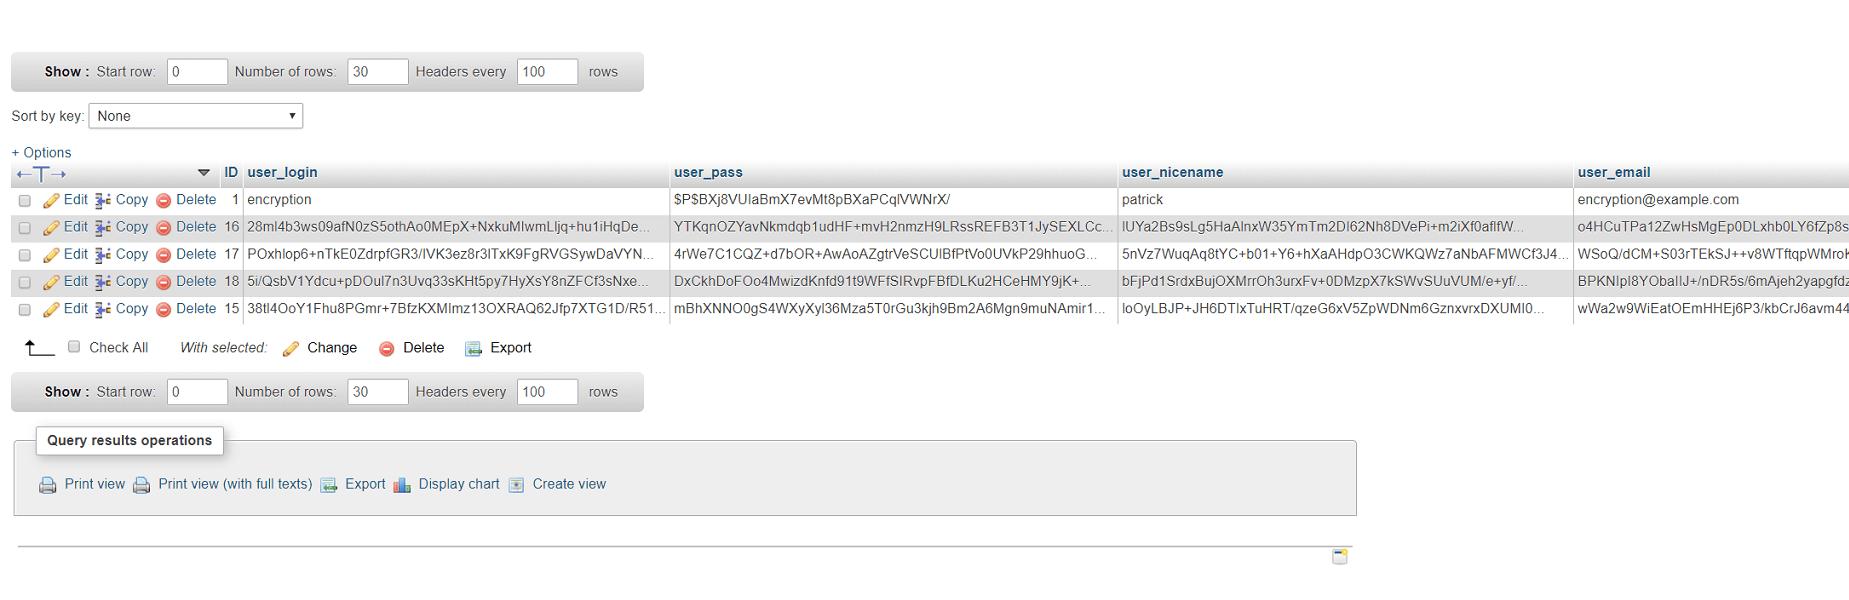 Encrypted User Database